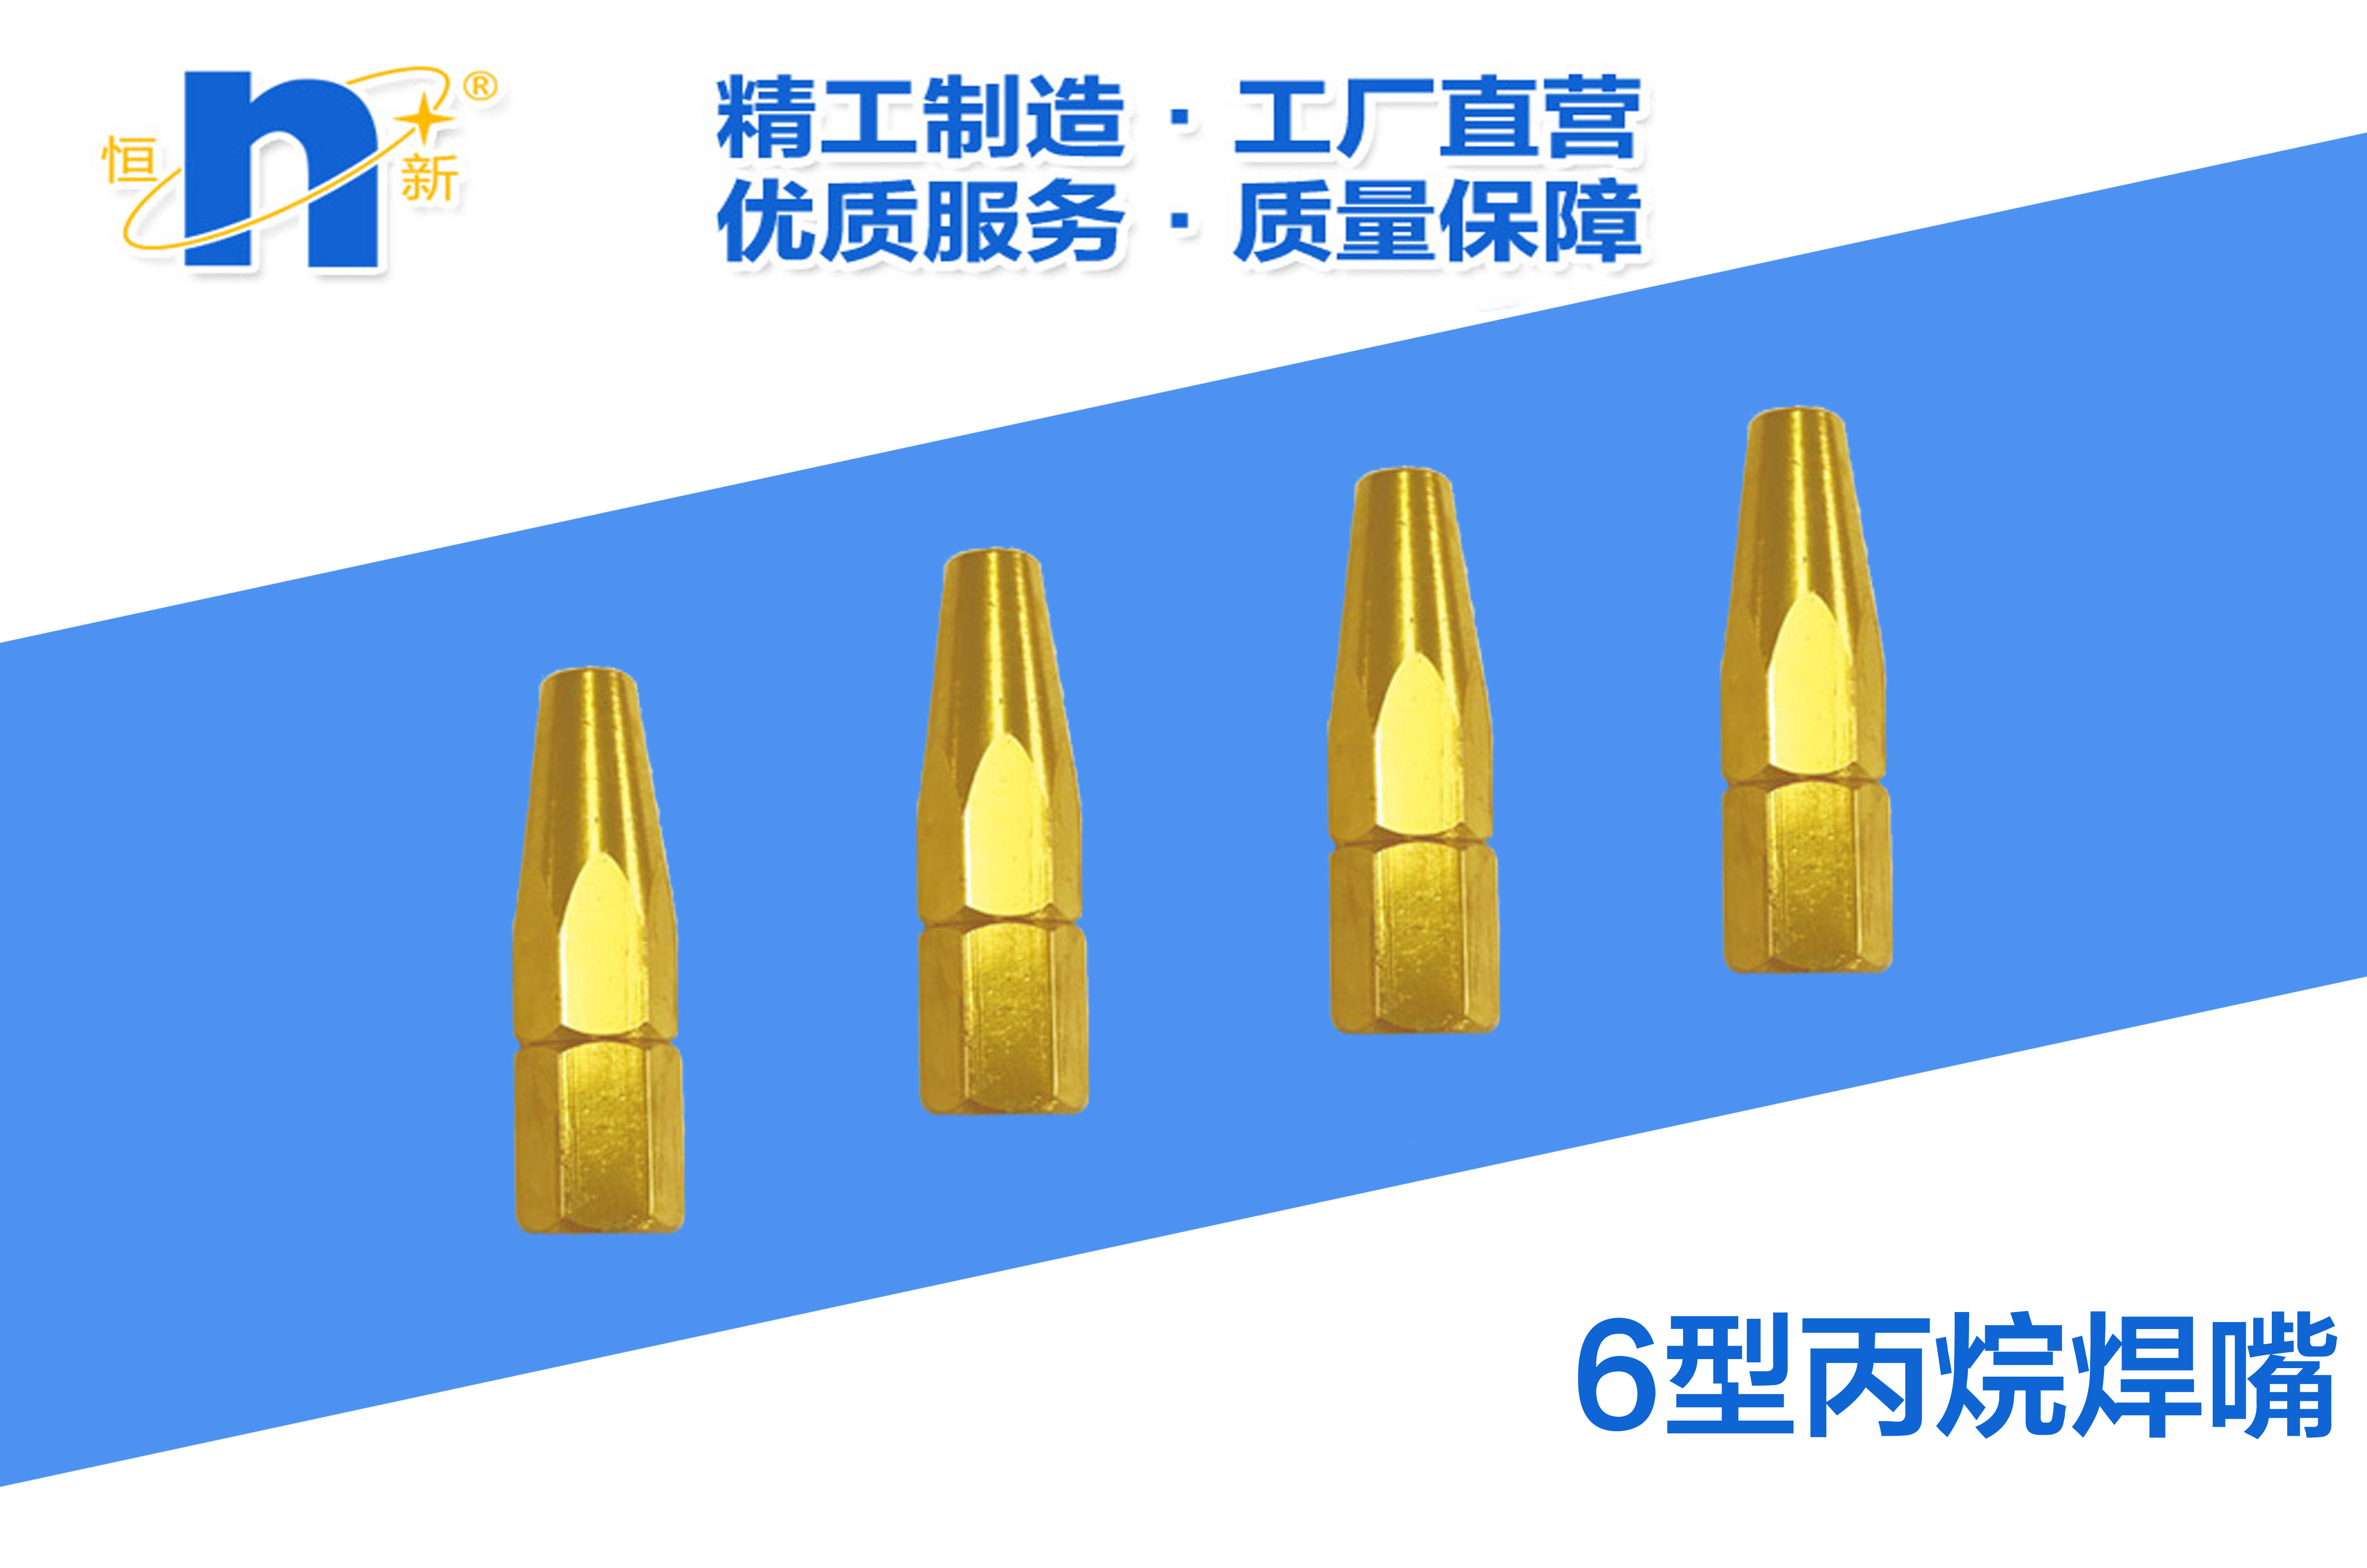 H07-6丙烷焊嘴  恒新